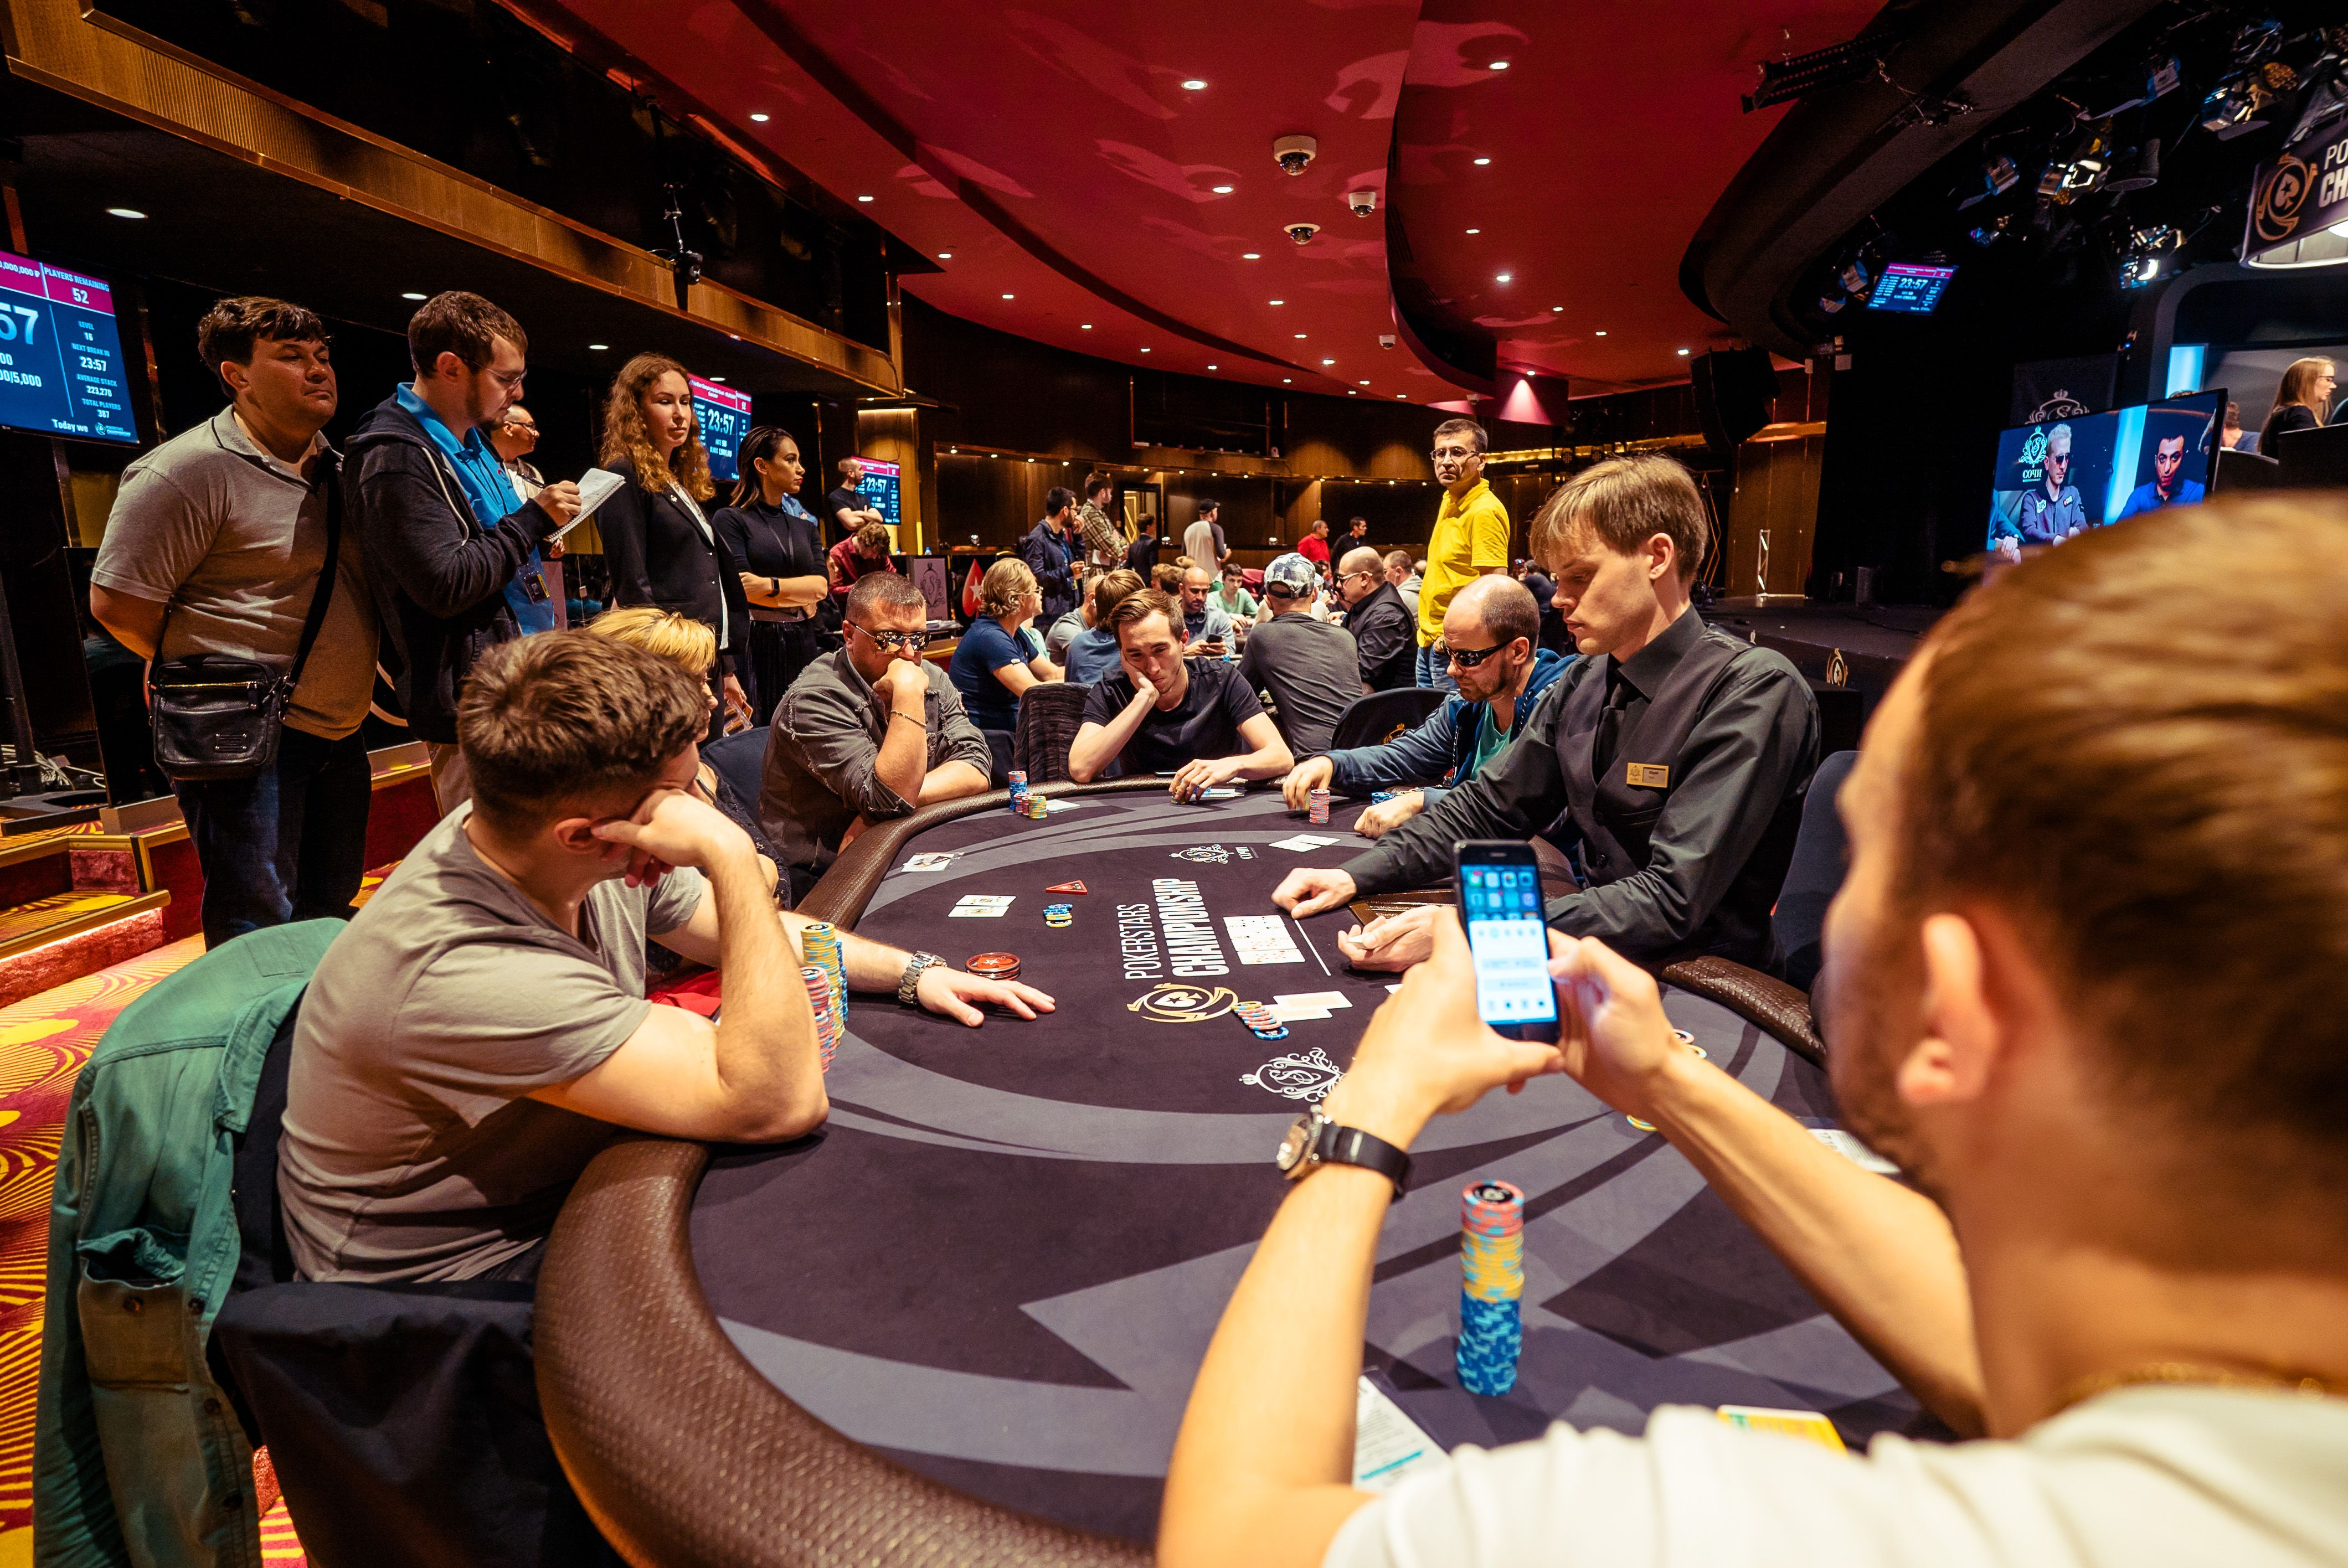 Pokerstars казино в россии порно казино без границ онлайн